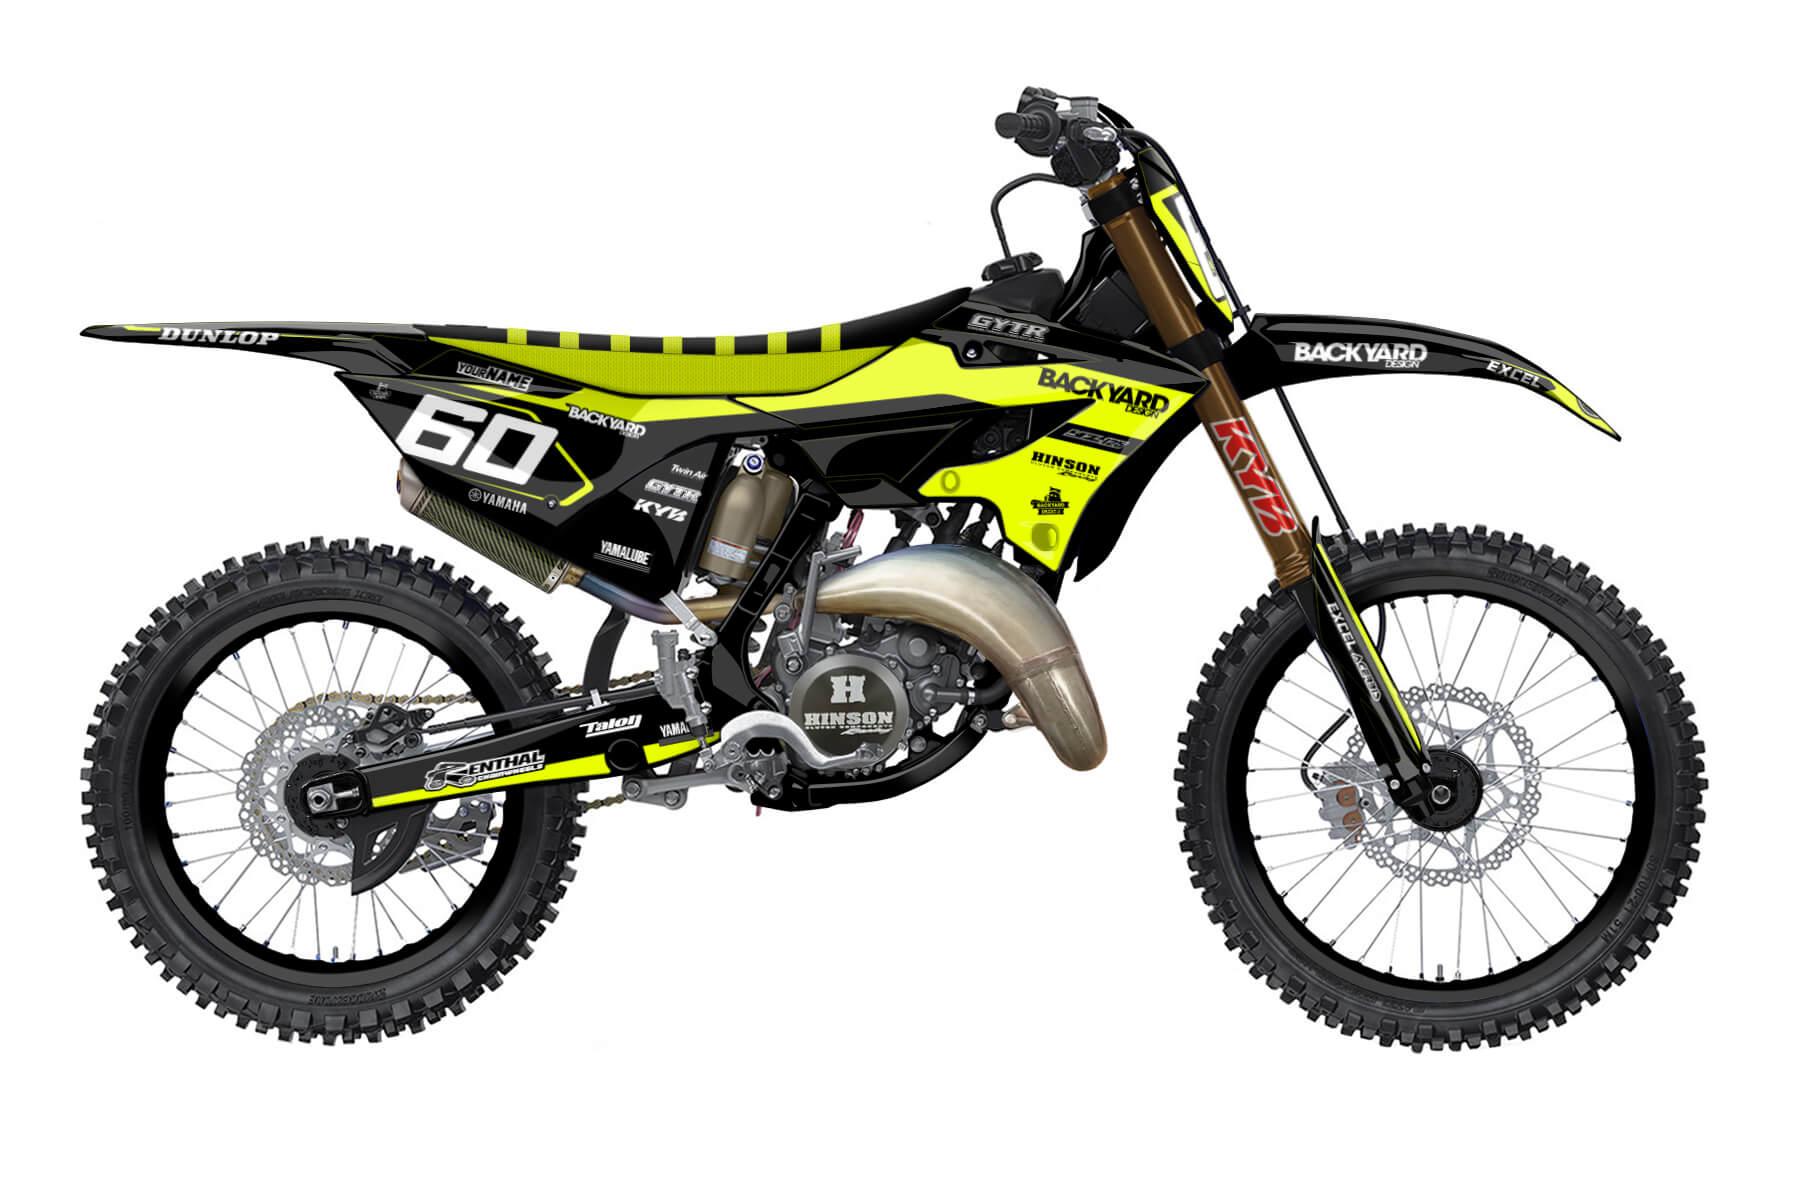 Yamaha YZ 250 - 2022 - Backyard Design - Mx Dekor - General Neon